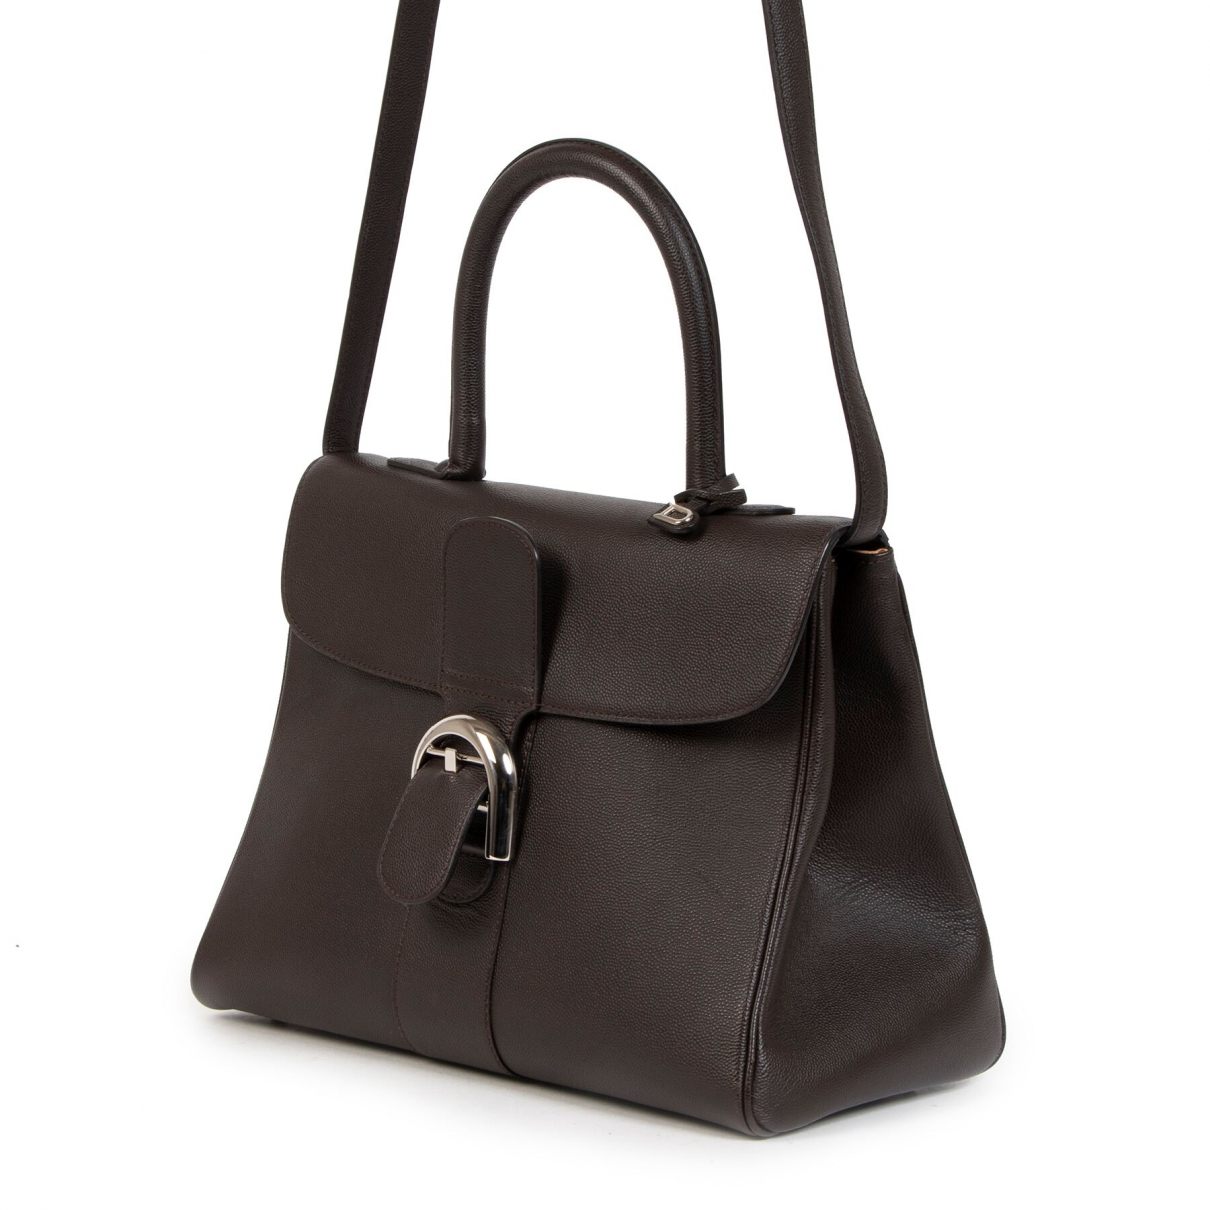 Delvaux Le Brillant Handtasche in  Braun Leder